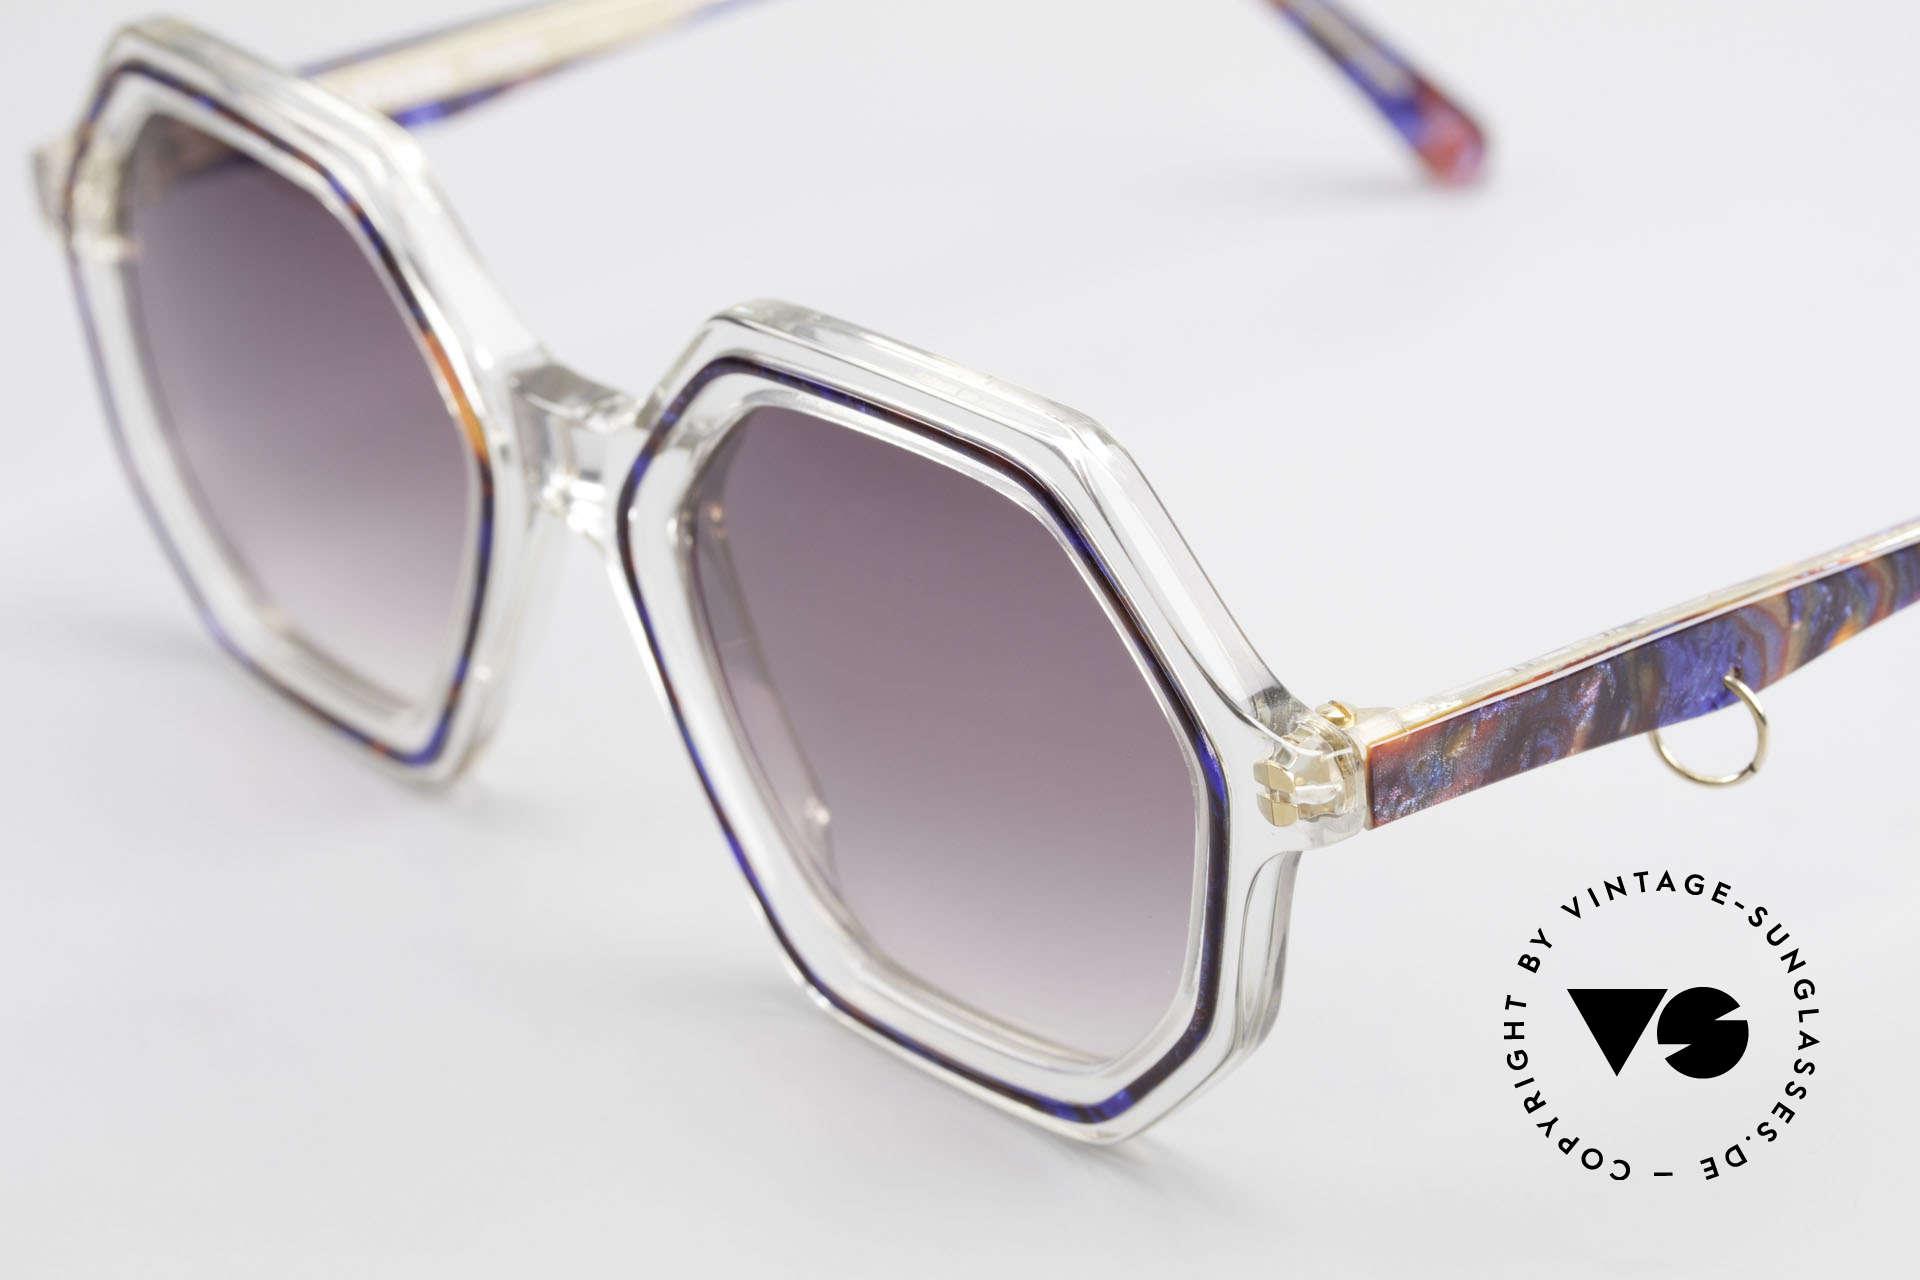 Sonia Rykiel SR46 756 Octagonal 70's Sunglasses, unworn designer piece (like all our vintage sunglasses), Made for Women